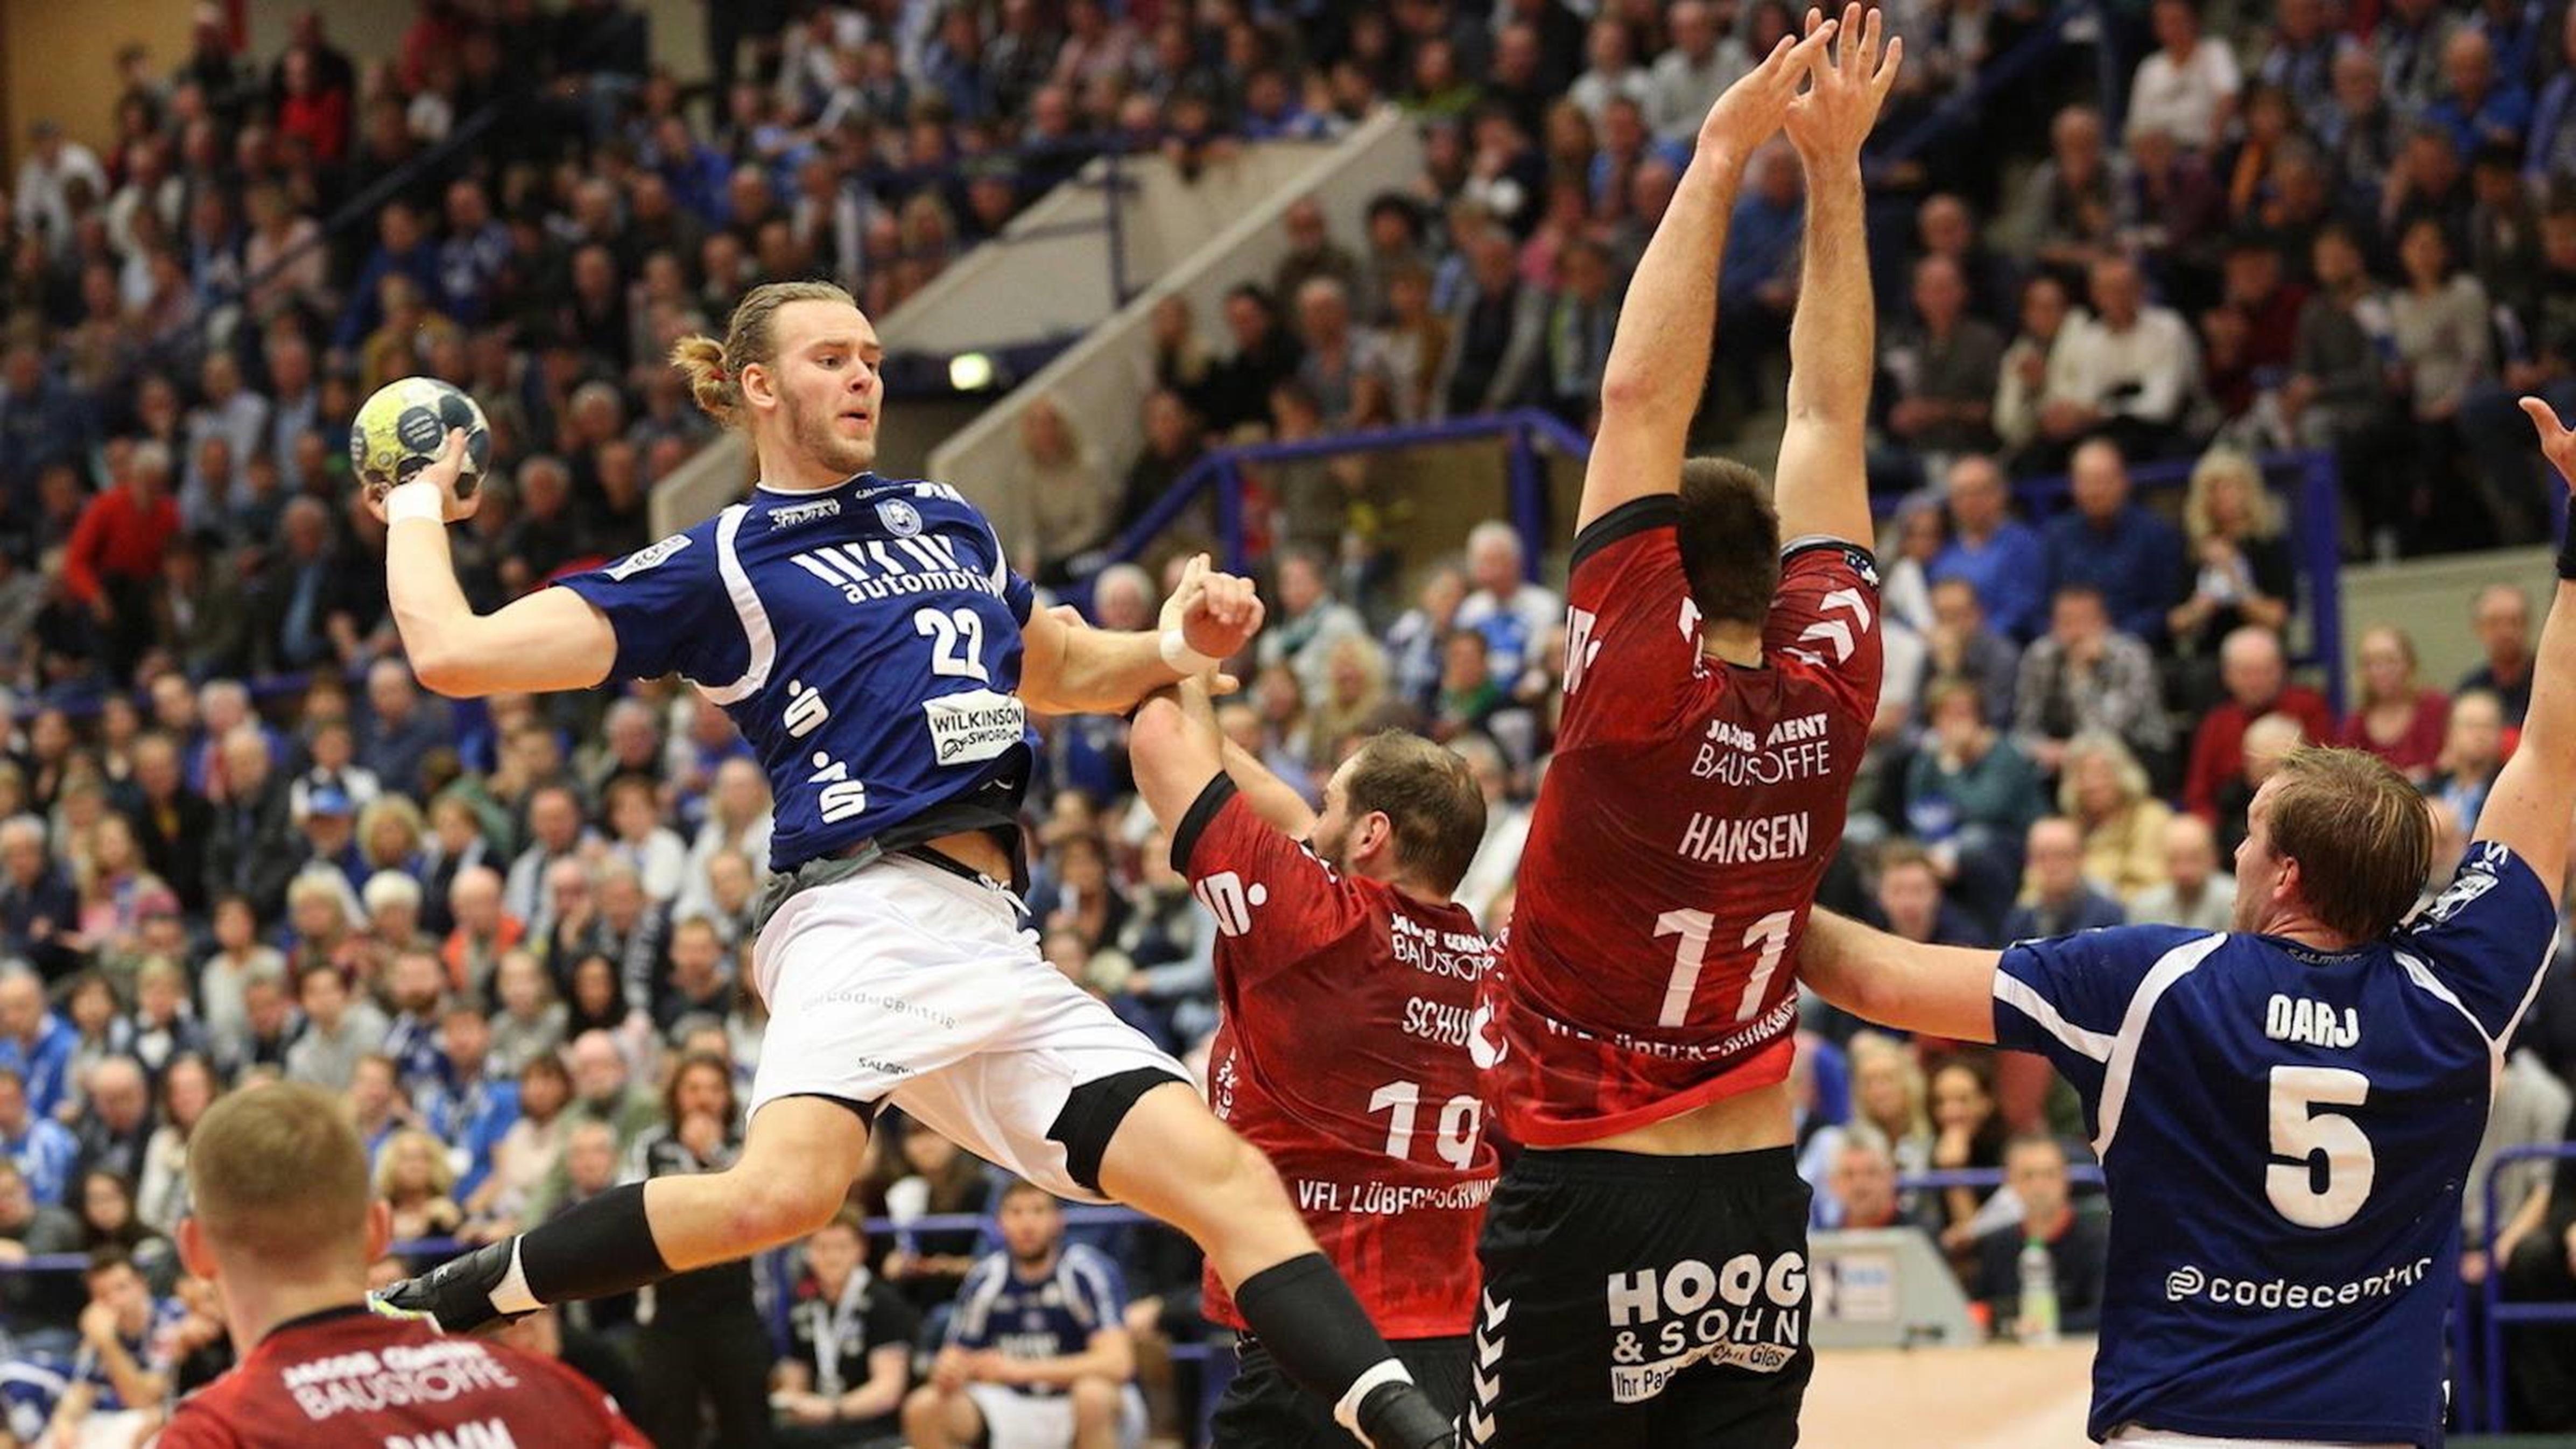 Bergischer Handballclub 06